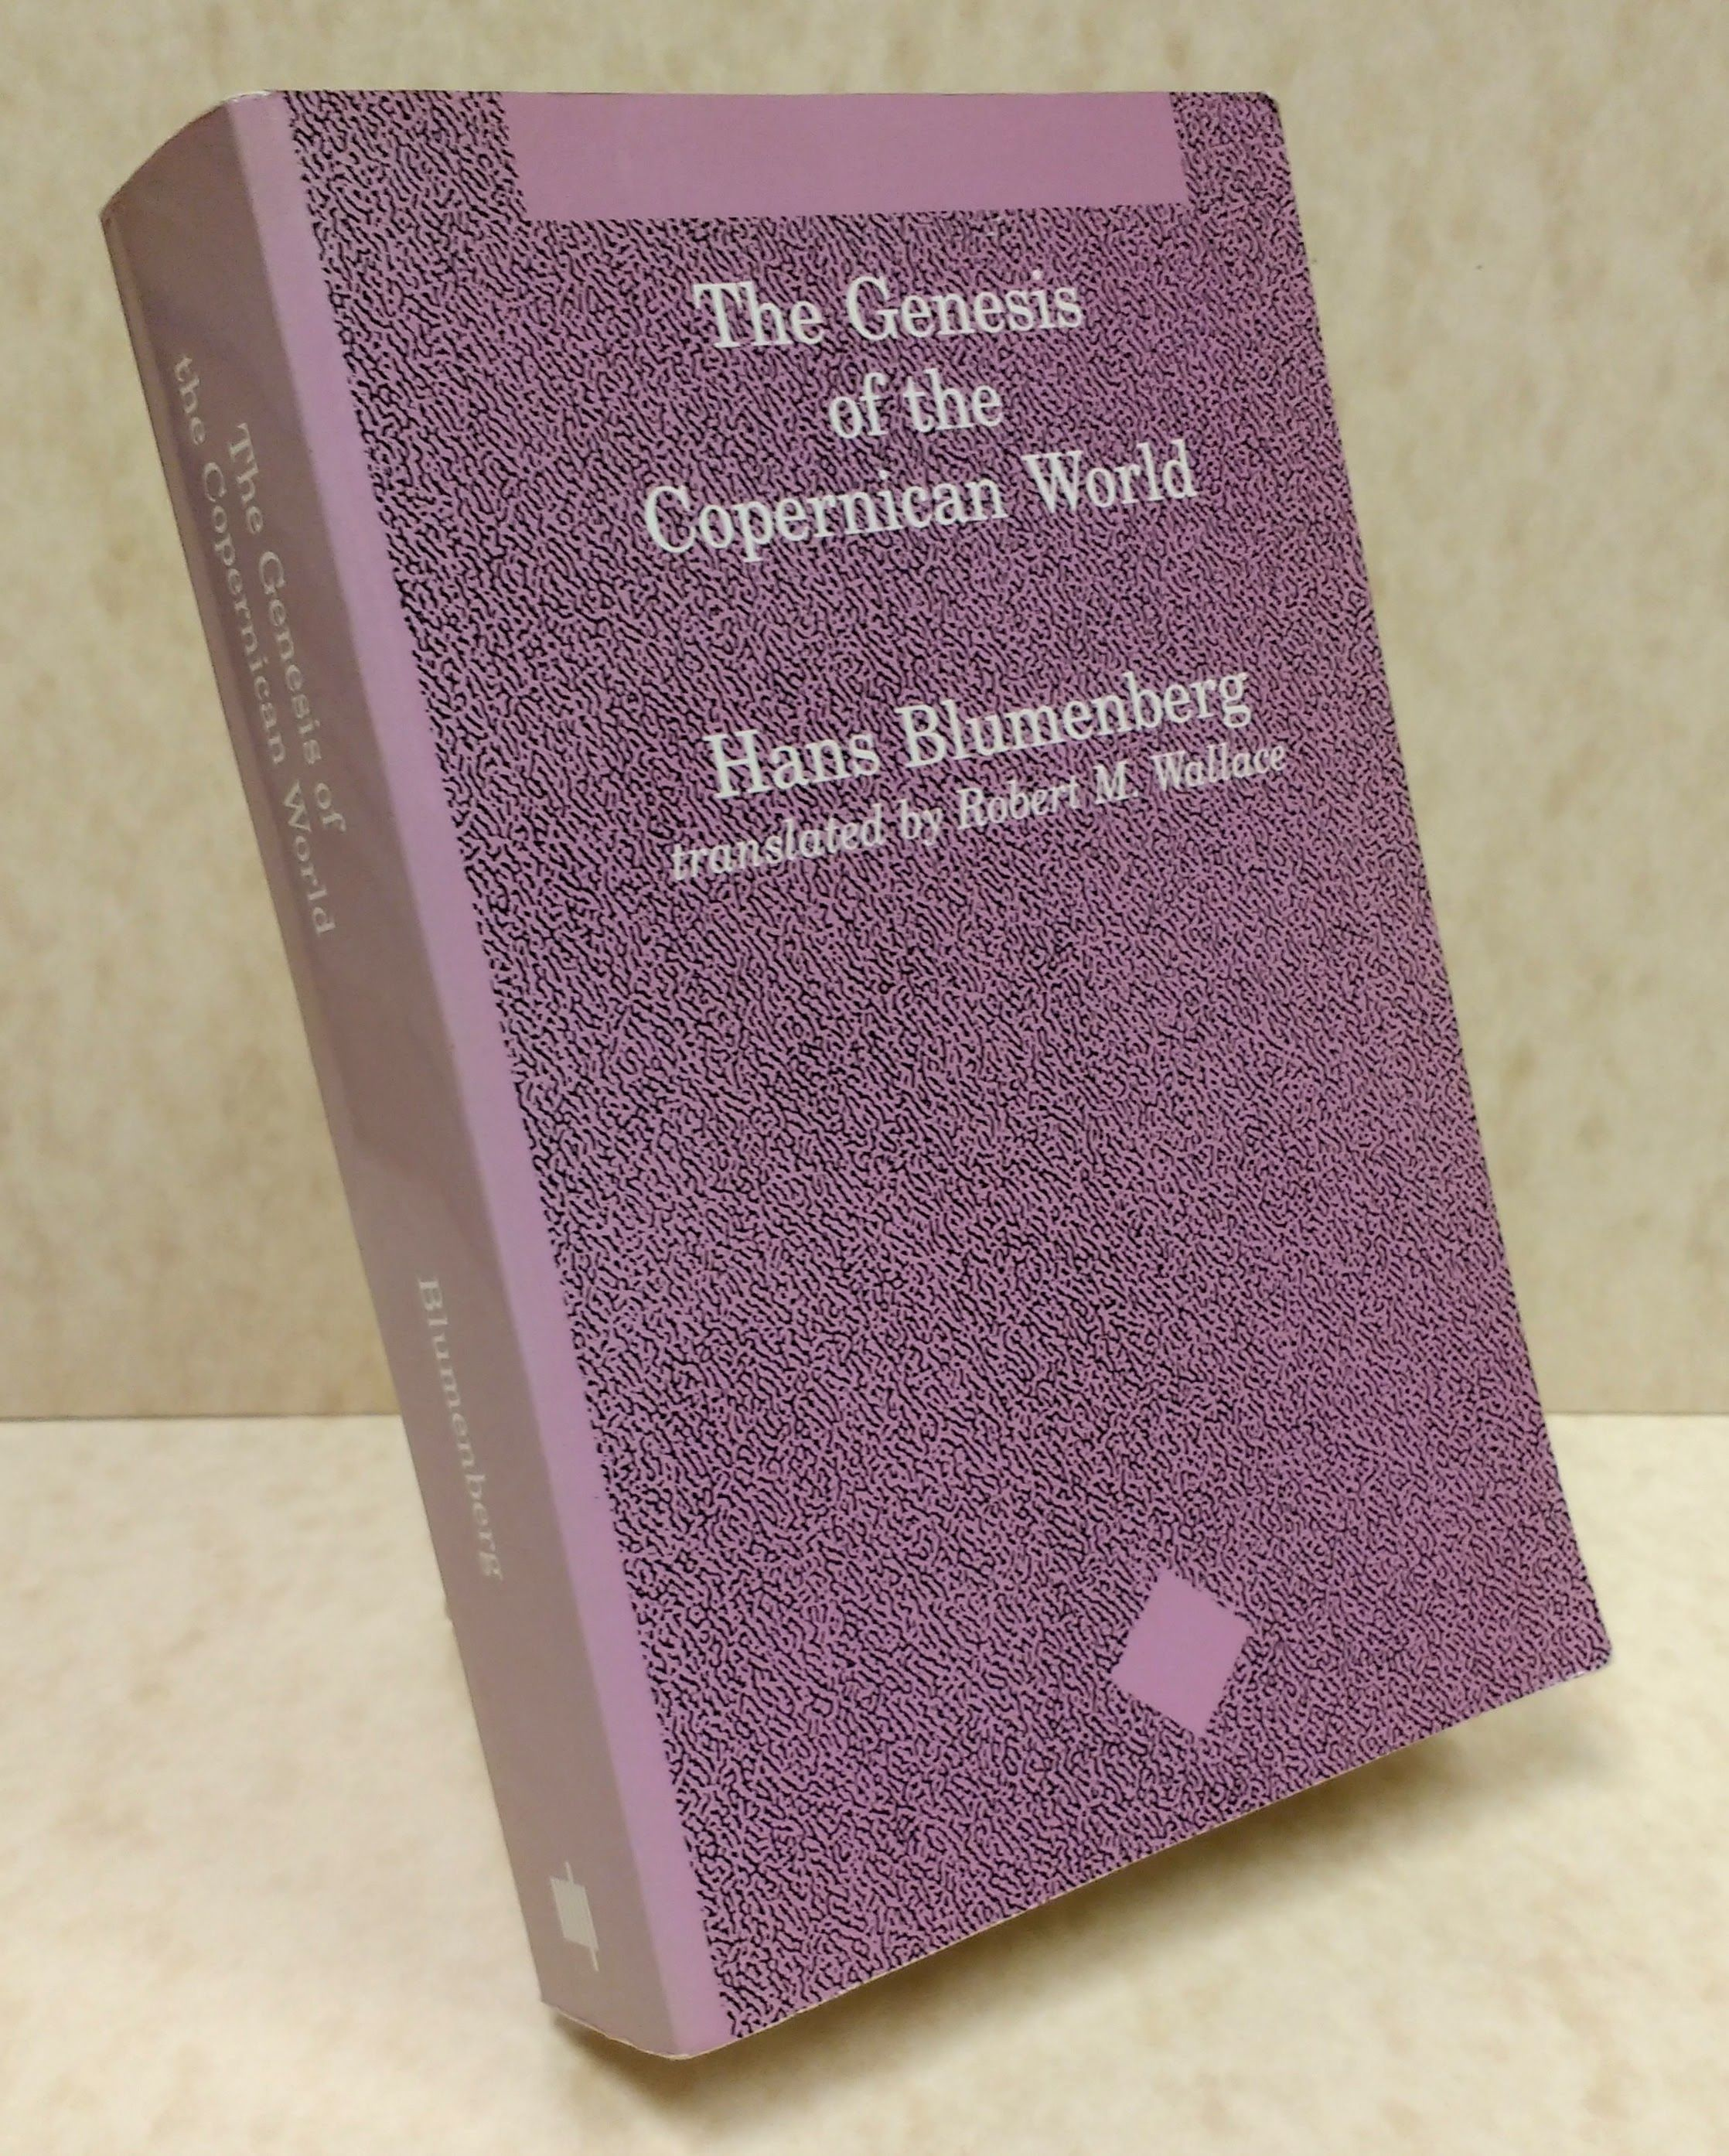 The Genesis of the Copernican World (Studies in Contemporary German Social Thought), Blumenberg, Hans; McCarthy, Thomas [Series Editor]; Wallace, Robert M. [Translator];